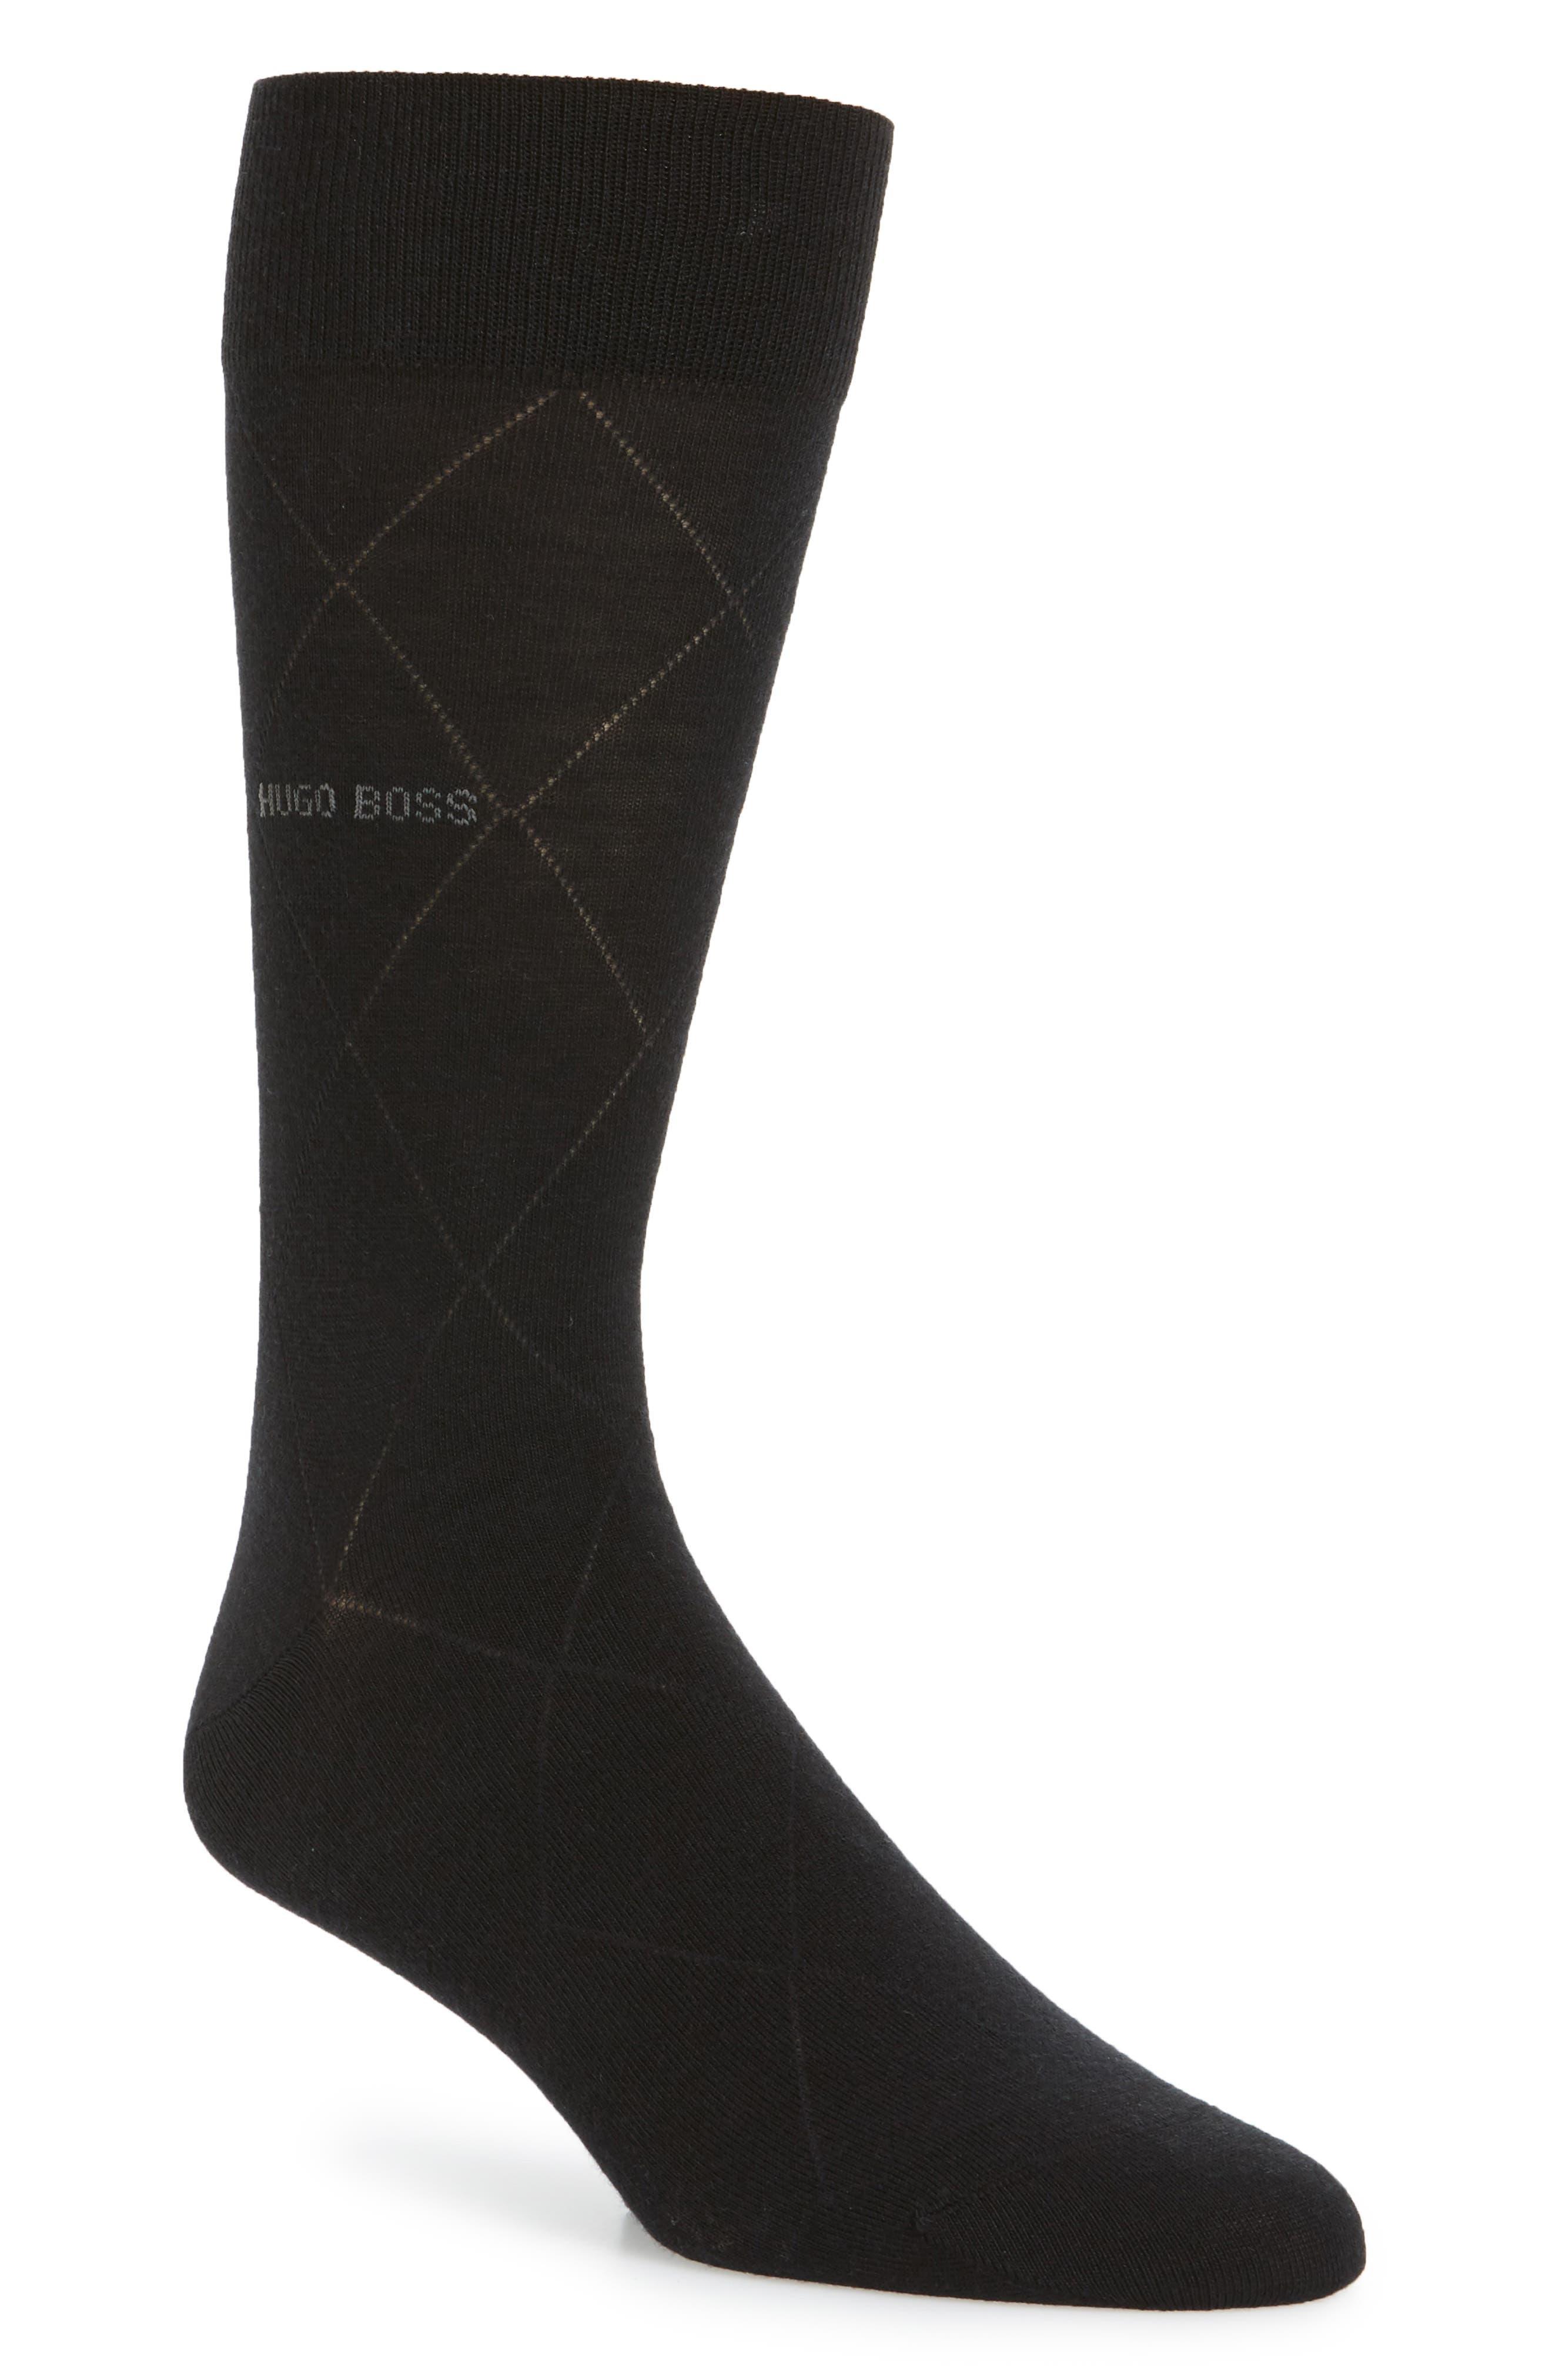 Argyle Crew Socks,                         Main,                         color, Black